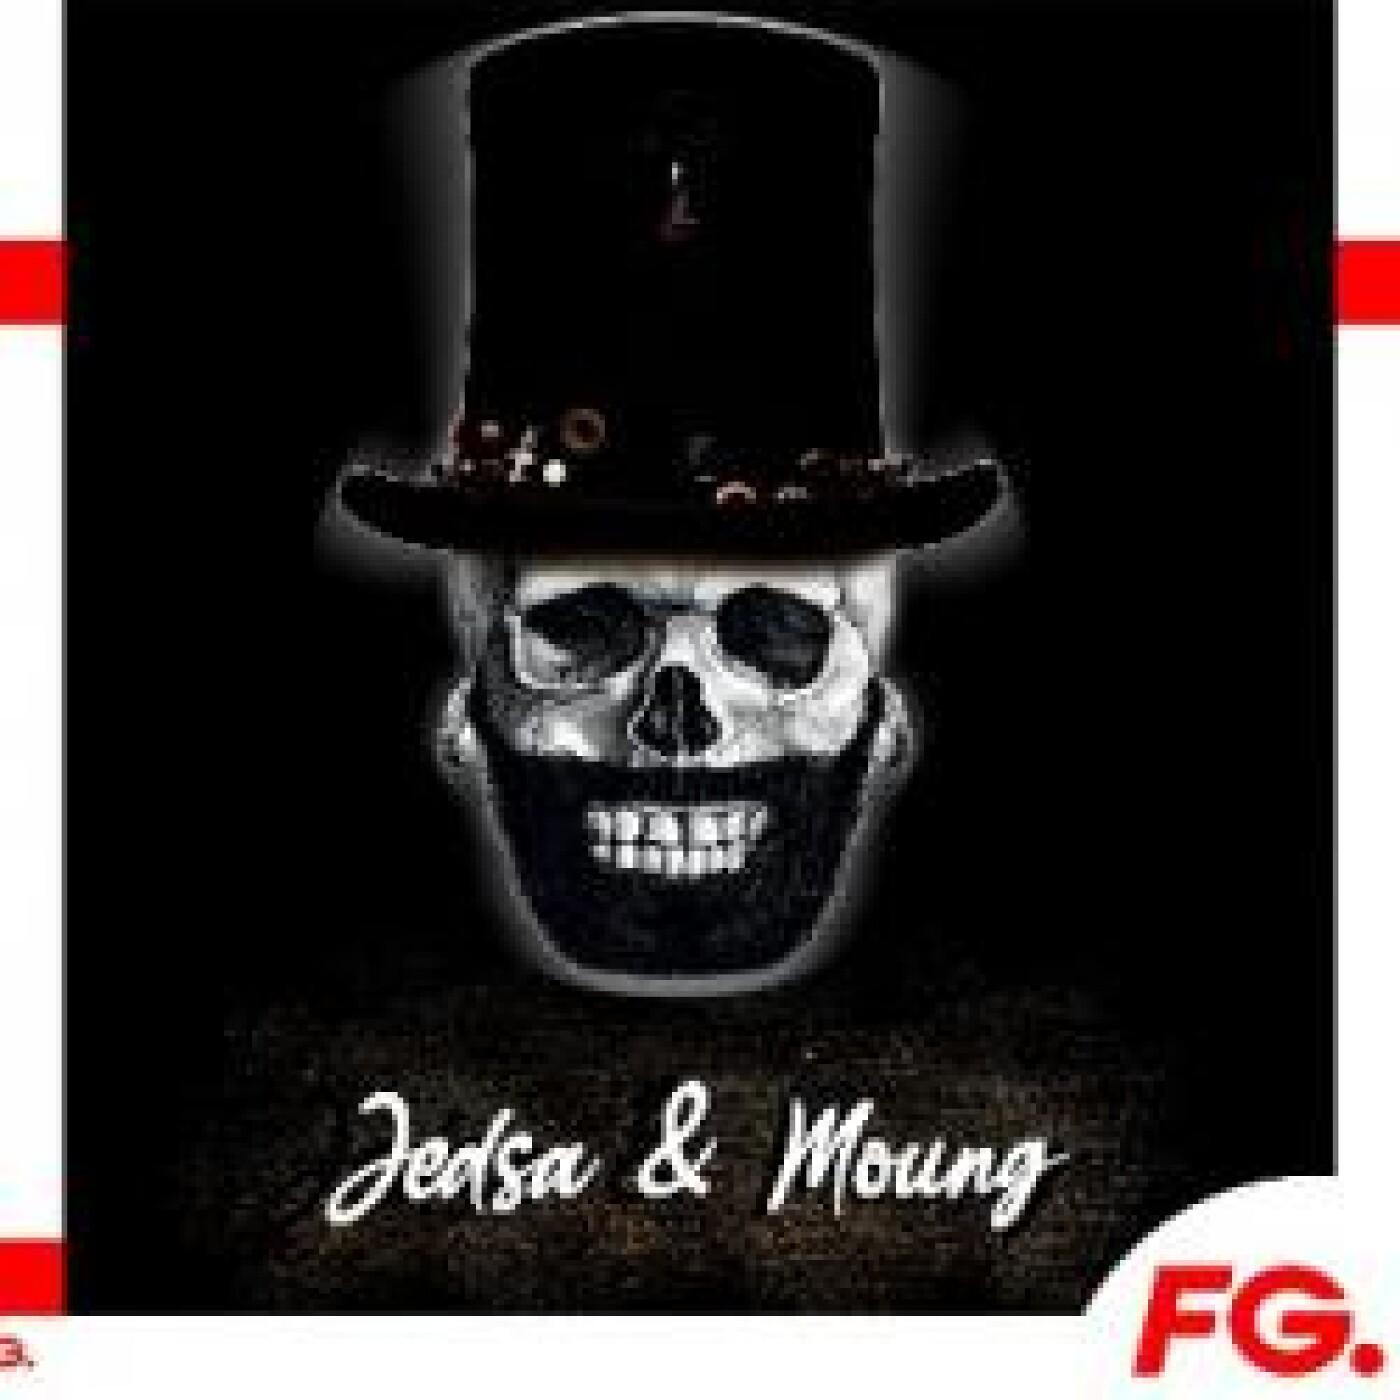 CLOUD PARTY : JEDSA & MOUNG